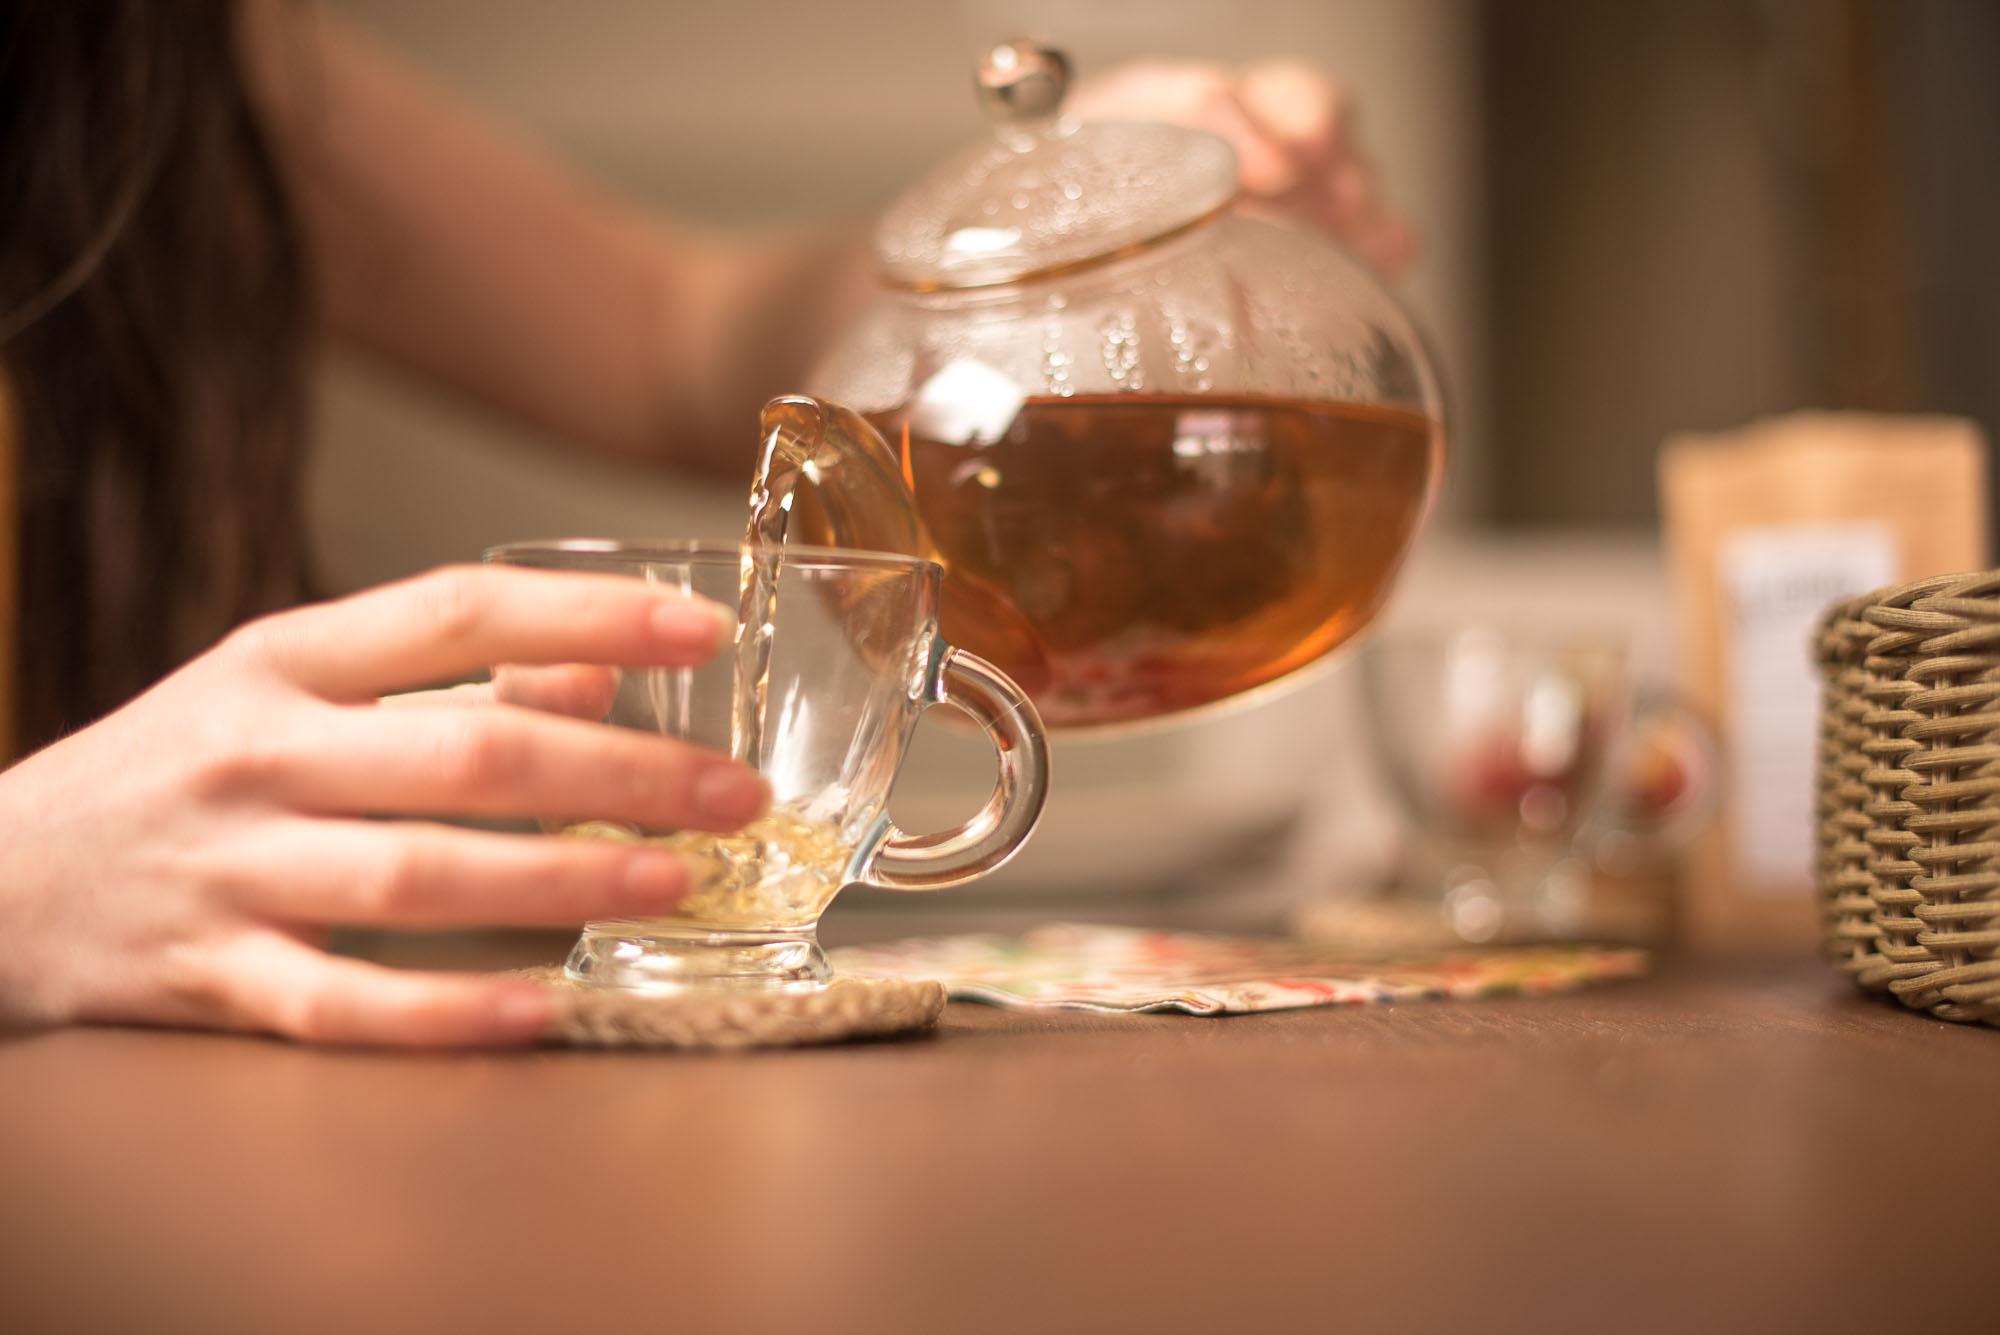 Peach Cobbler Bluebird Tea Co